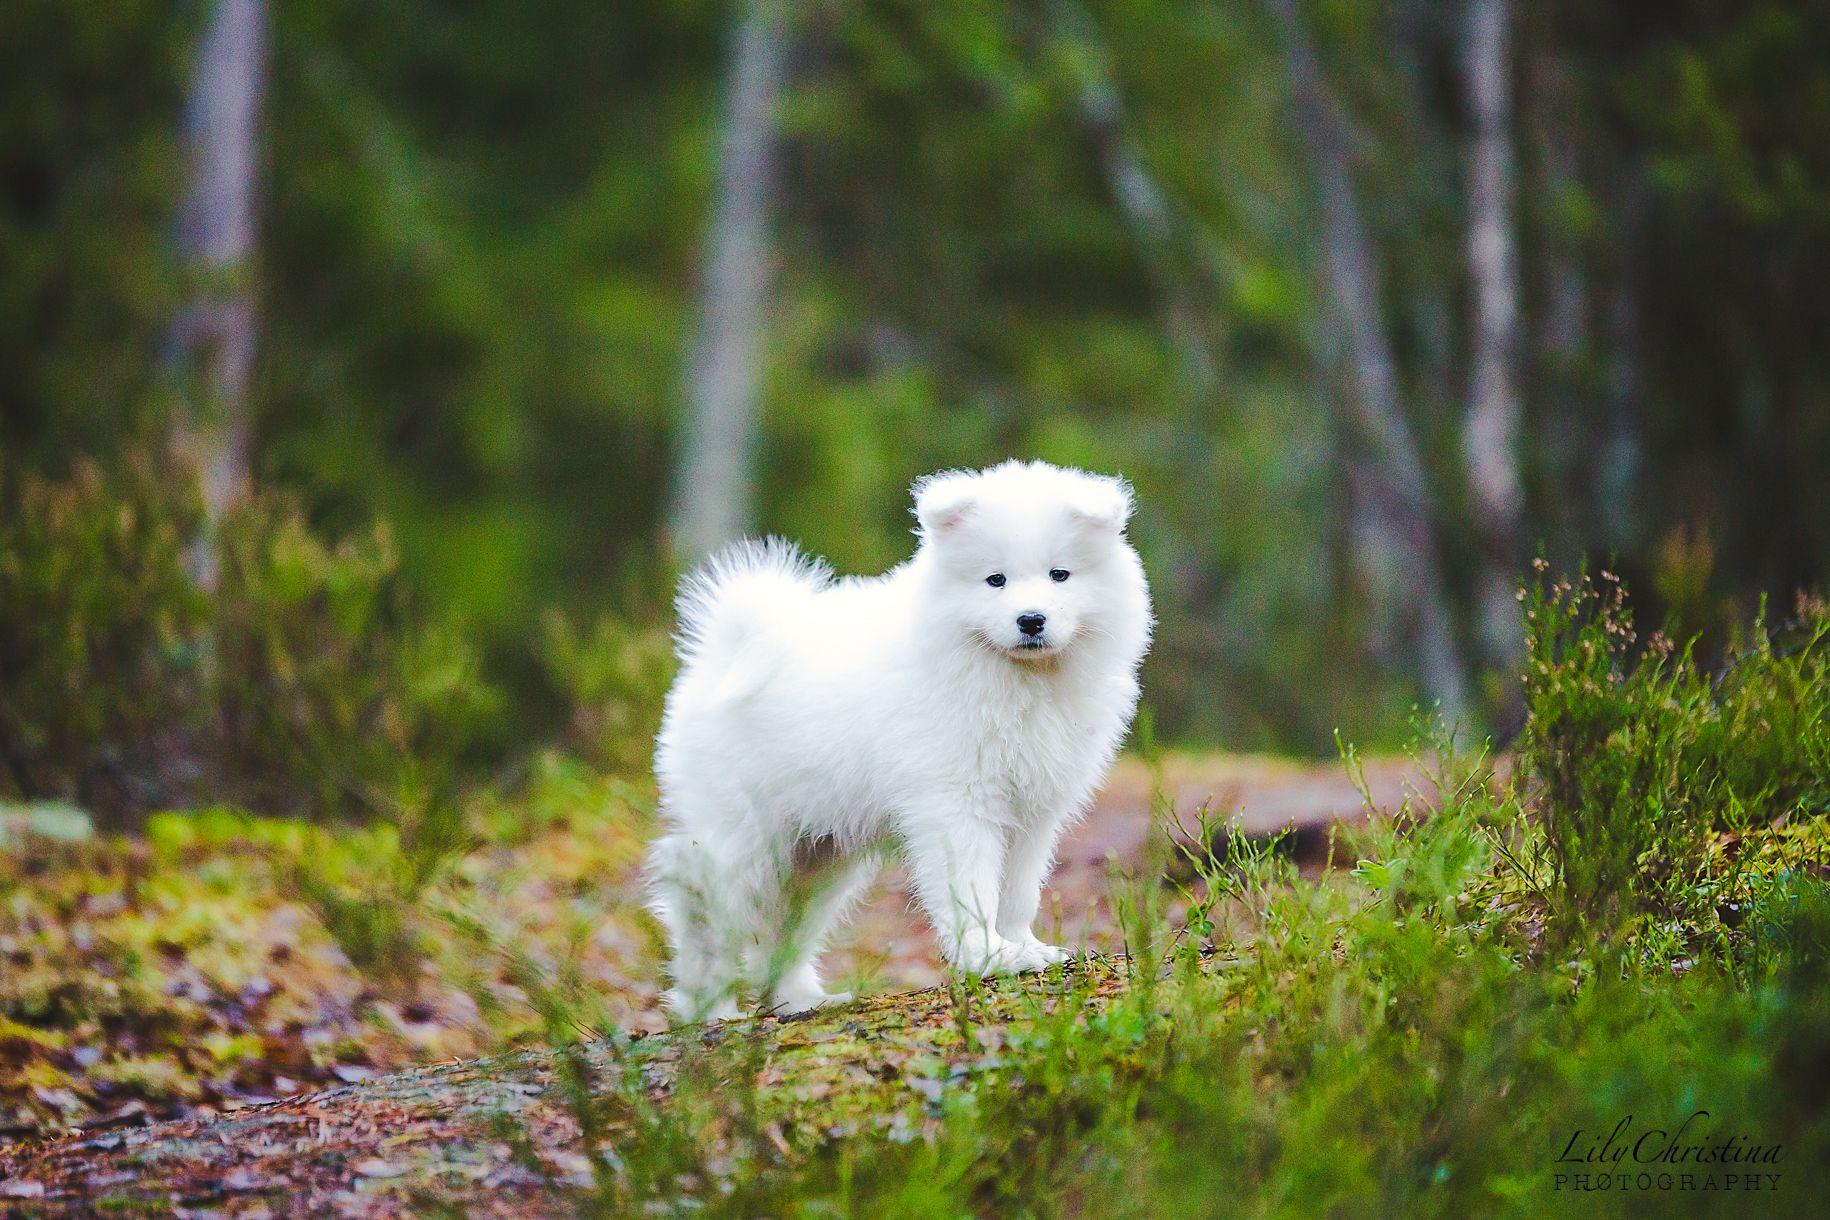 Uusi Perheenjasen Lili Koiranpentu Samojedi Koira